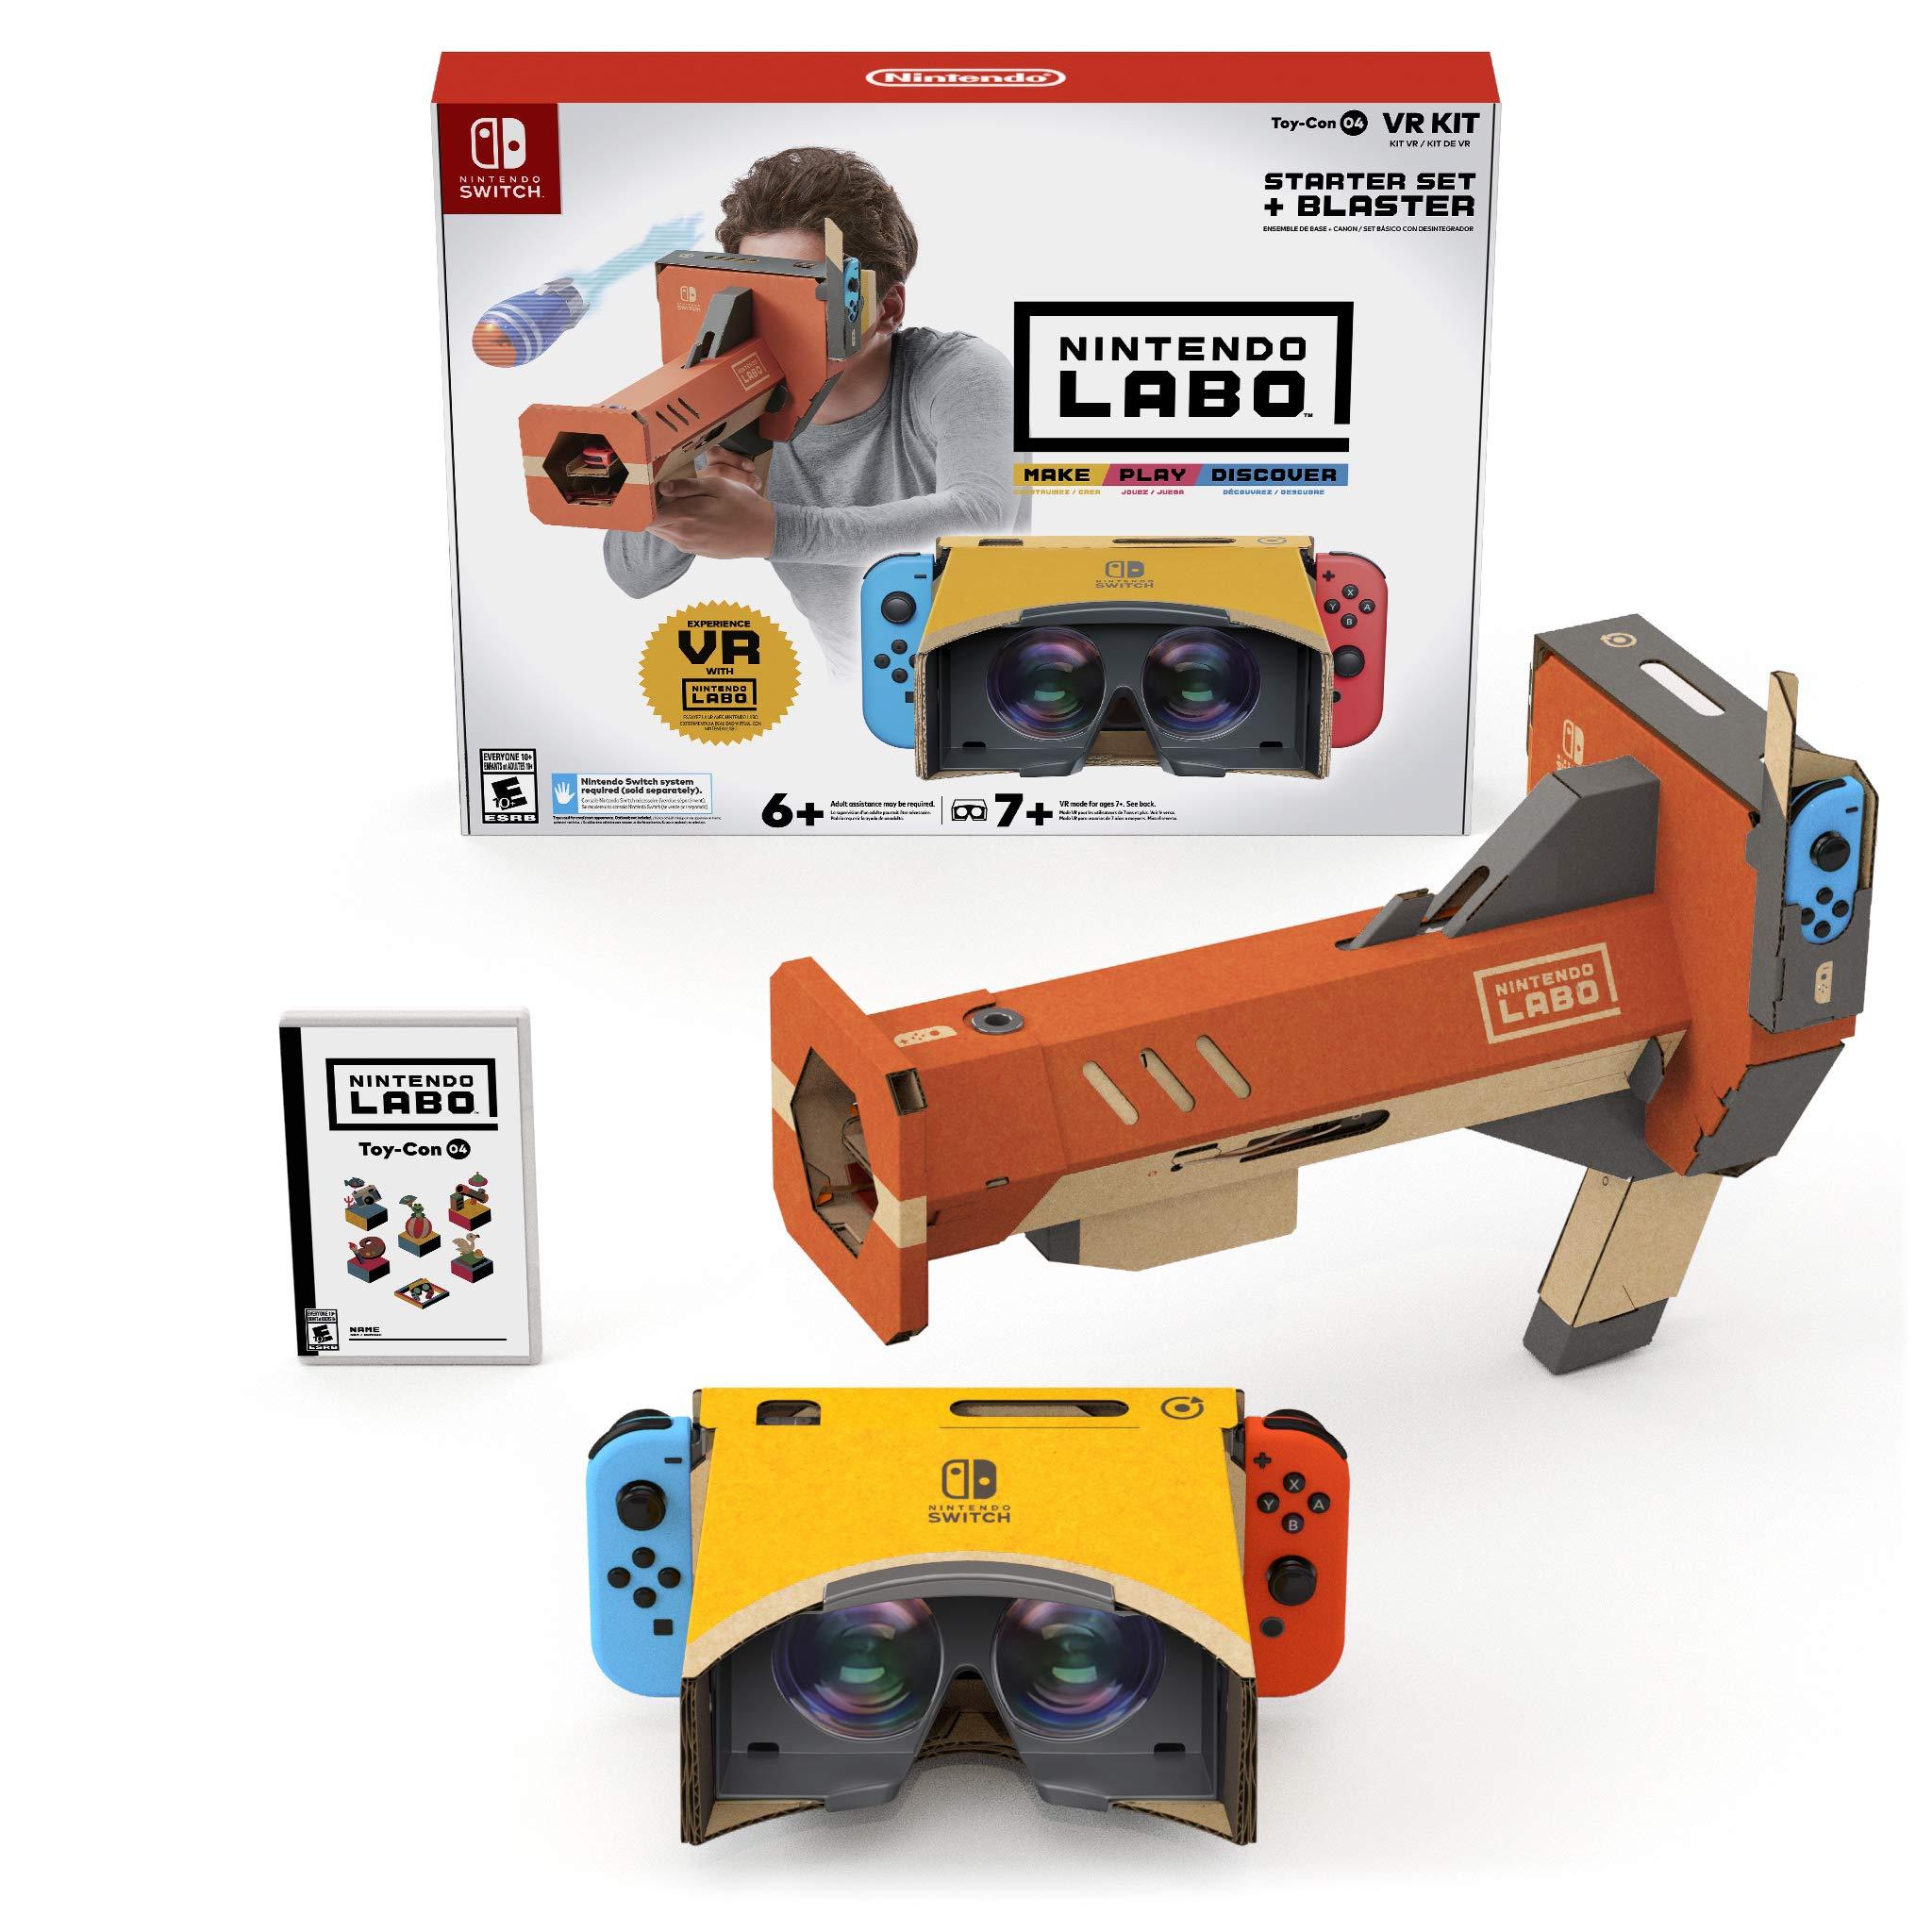 Nintendo Labo Toy-Con 04: VR Kit - Starter Set + Blaster - Switch by Nintendo (Image #2)